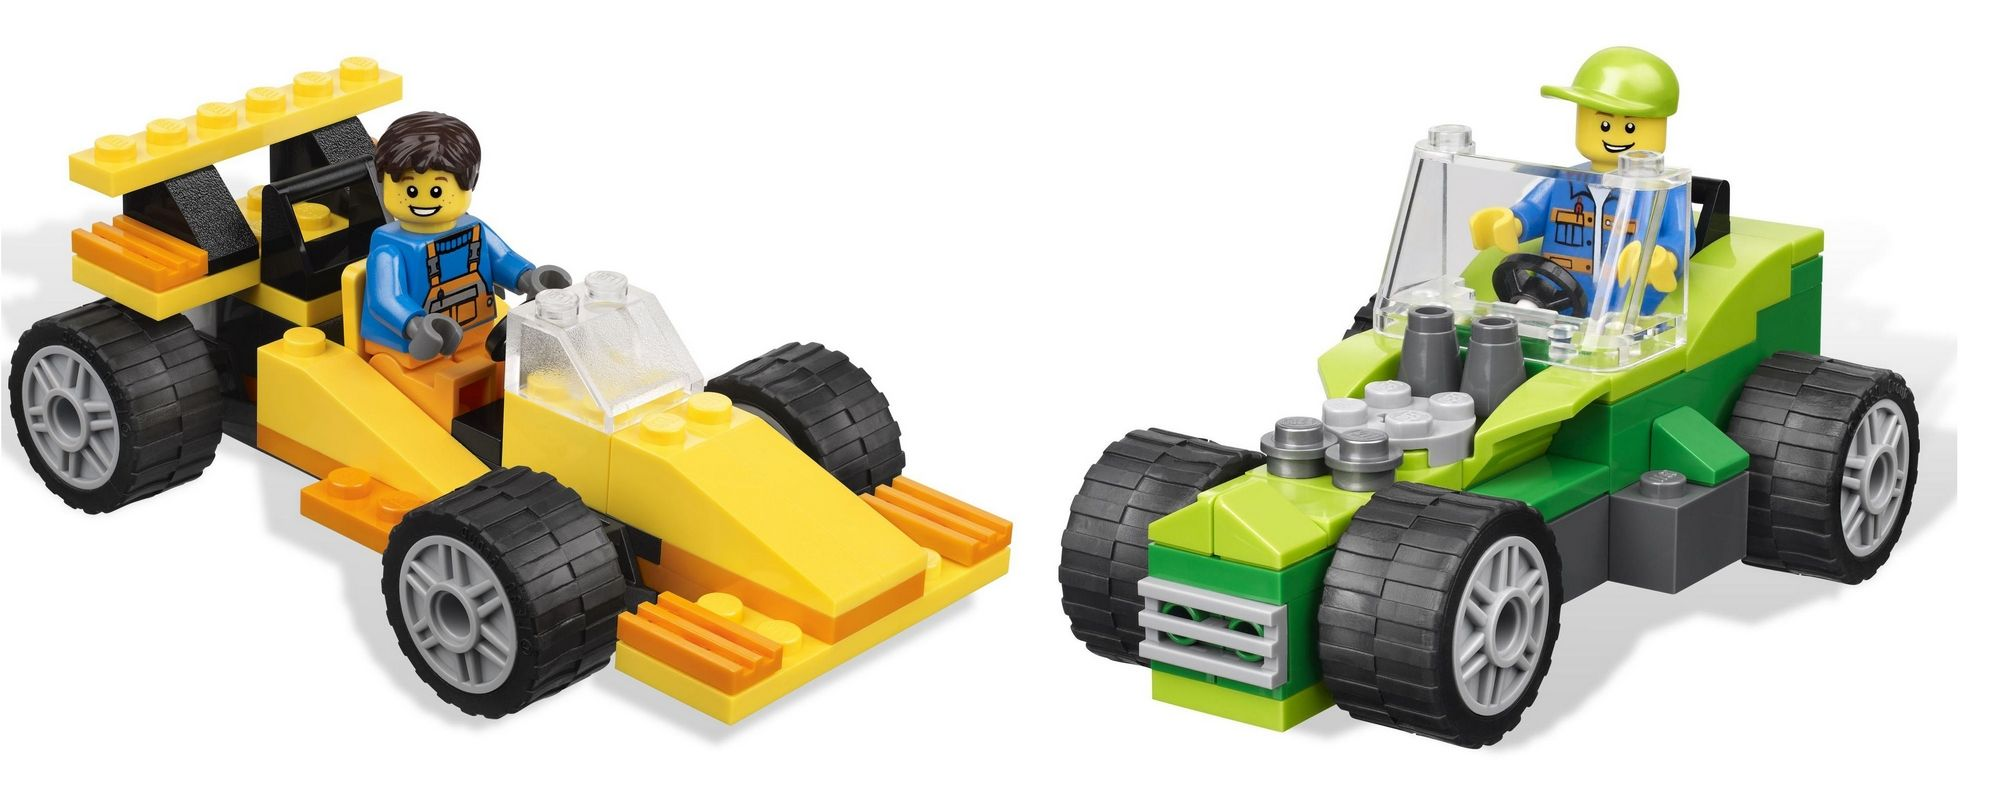 Lego 4635 – Fun With Vehicles | i Brick City